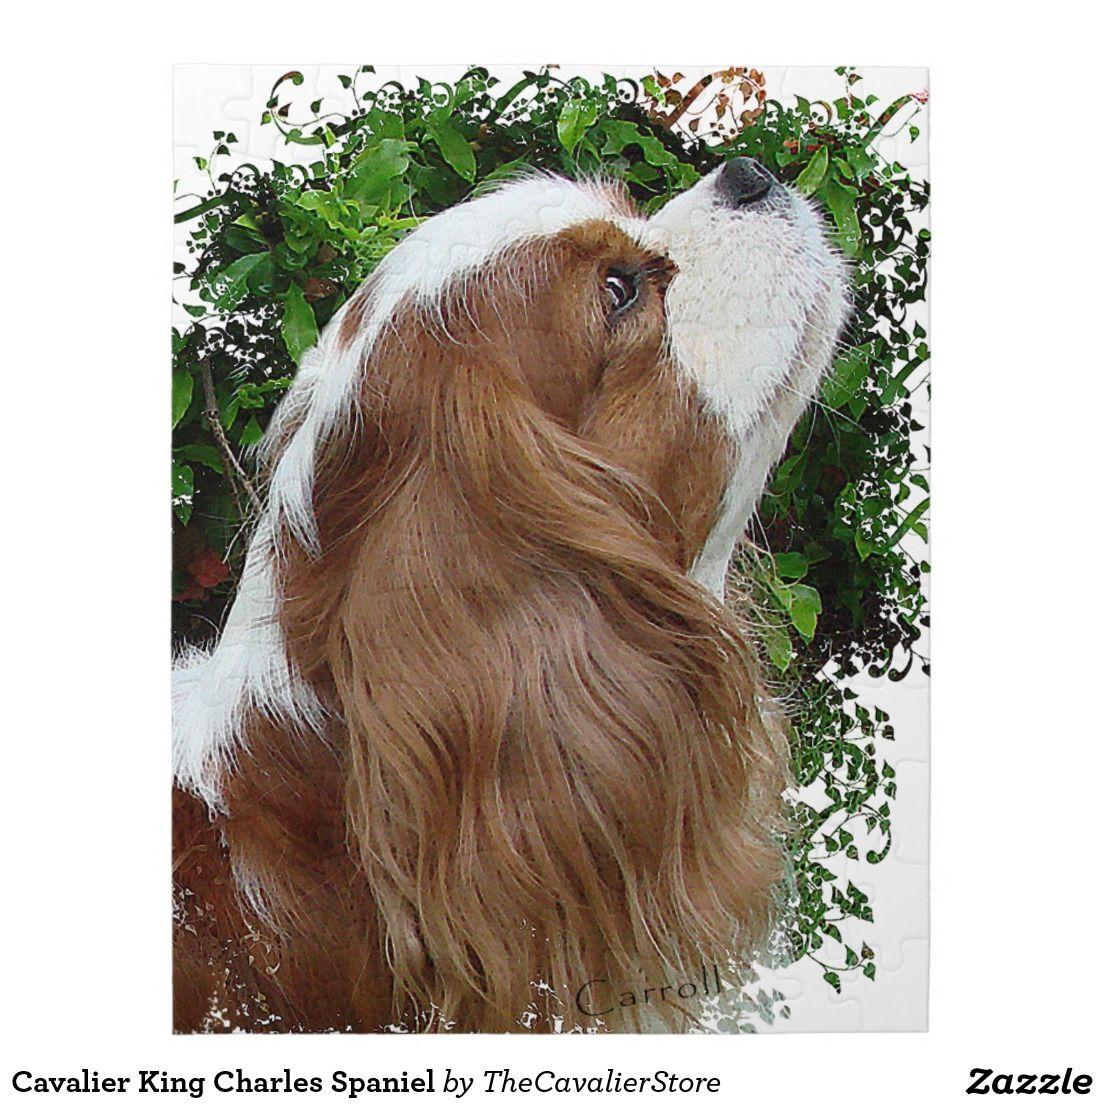 Cavalier King Charles Spaniel Jigsaw Puzzle Zazzle Com King Charles Spaniel Cavalier King Charles Spaniel Cavalier King Charles